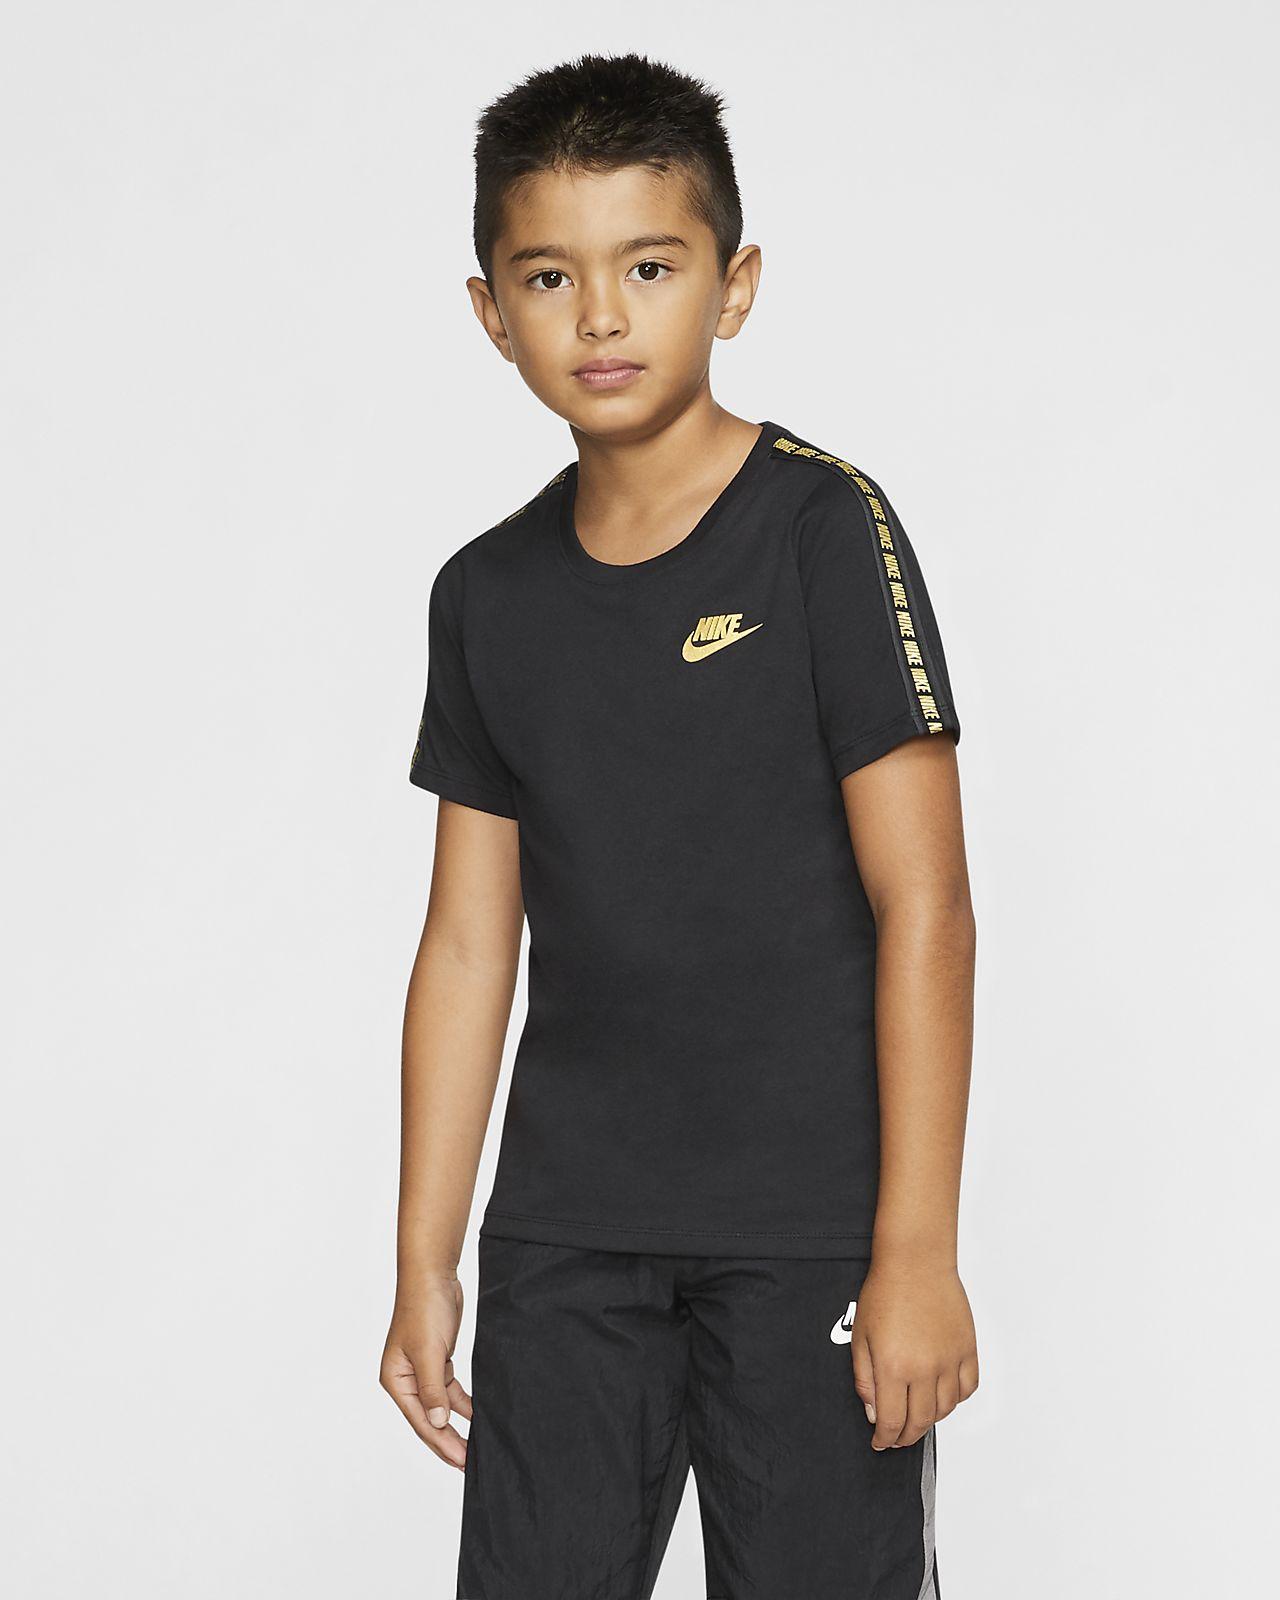 T-shirt Nike Sportswear Júnior